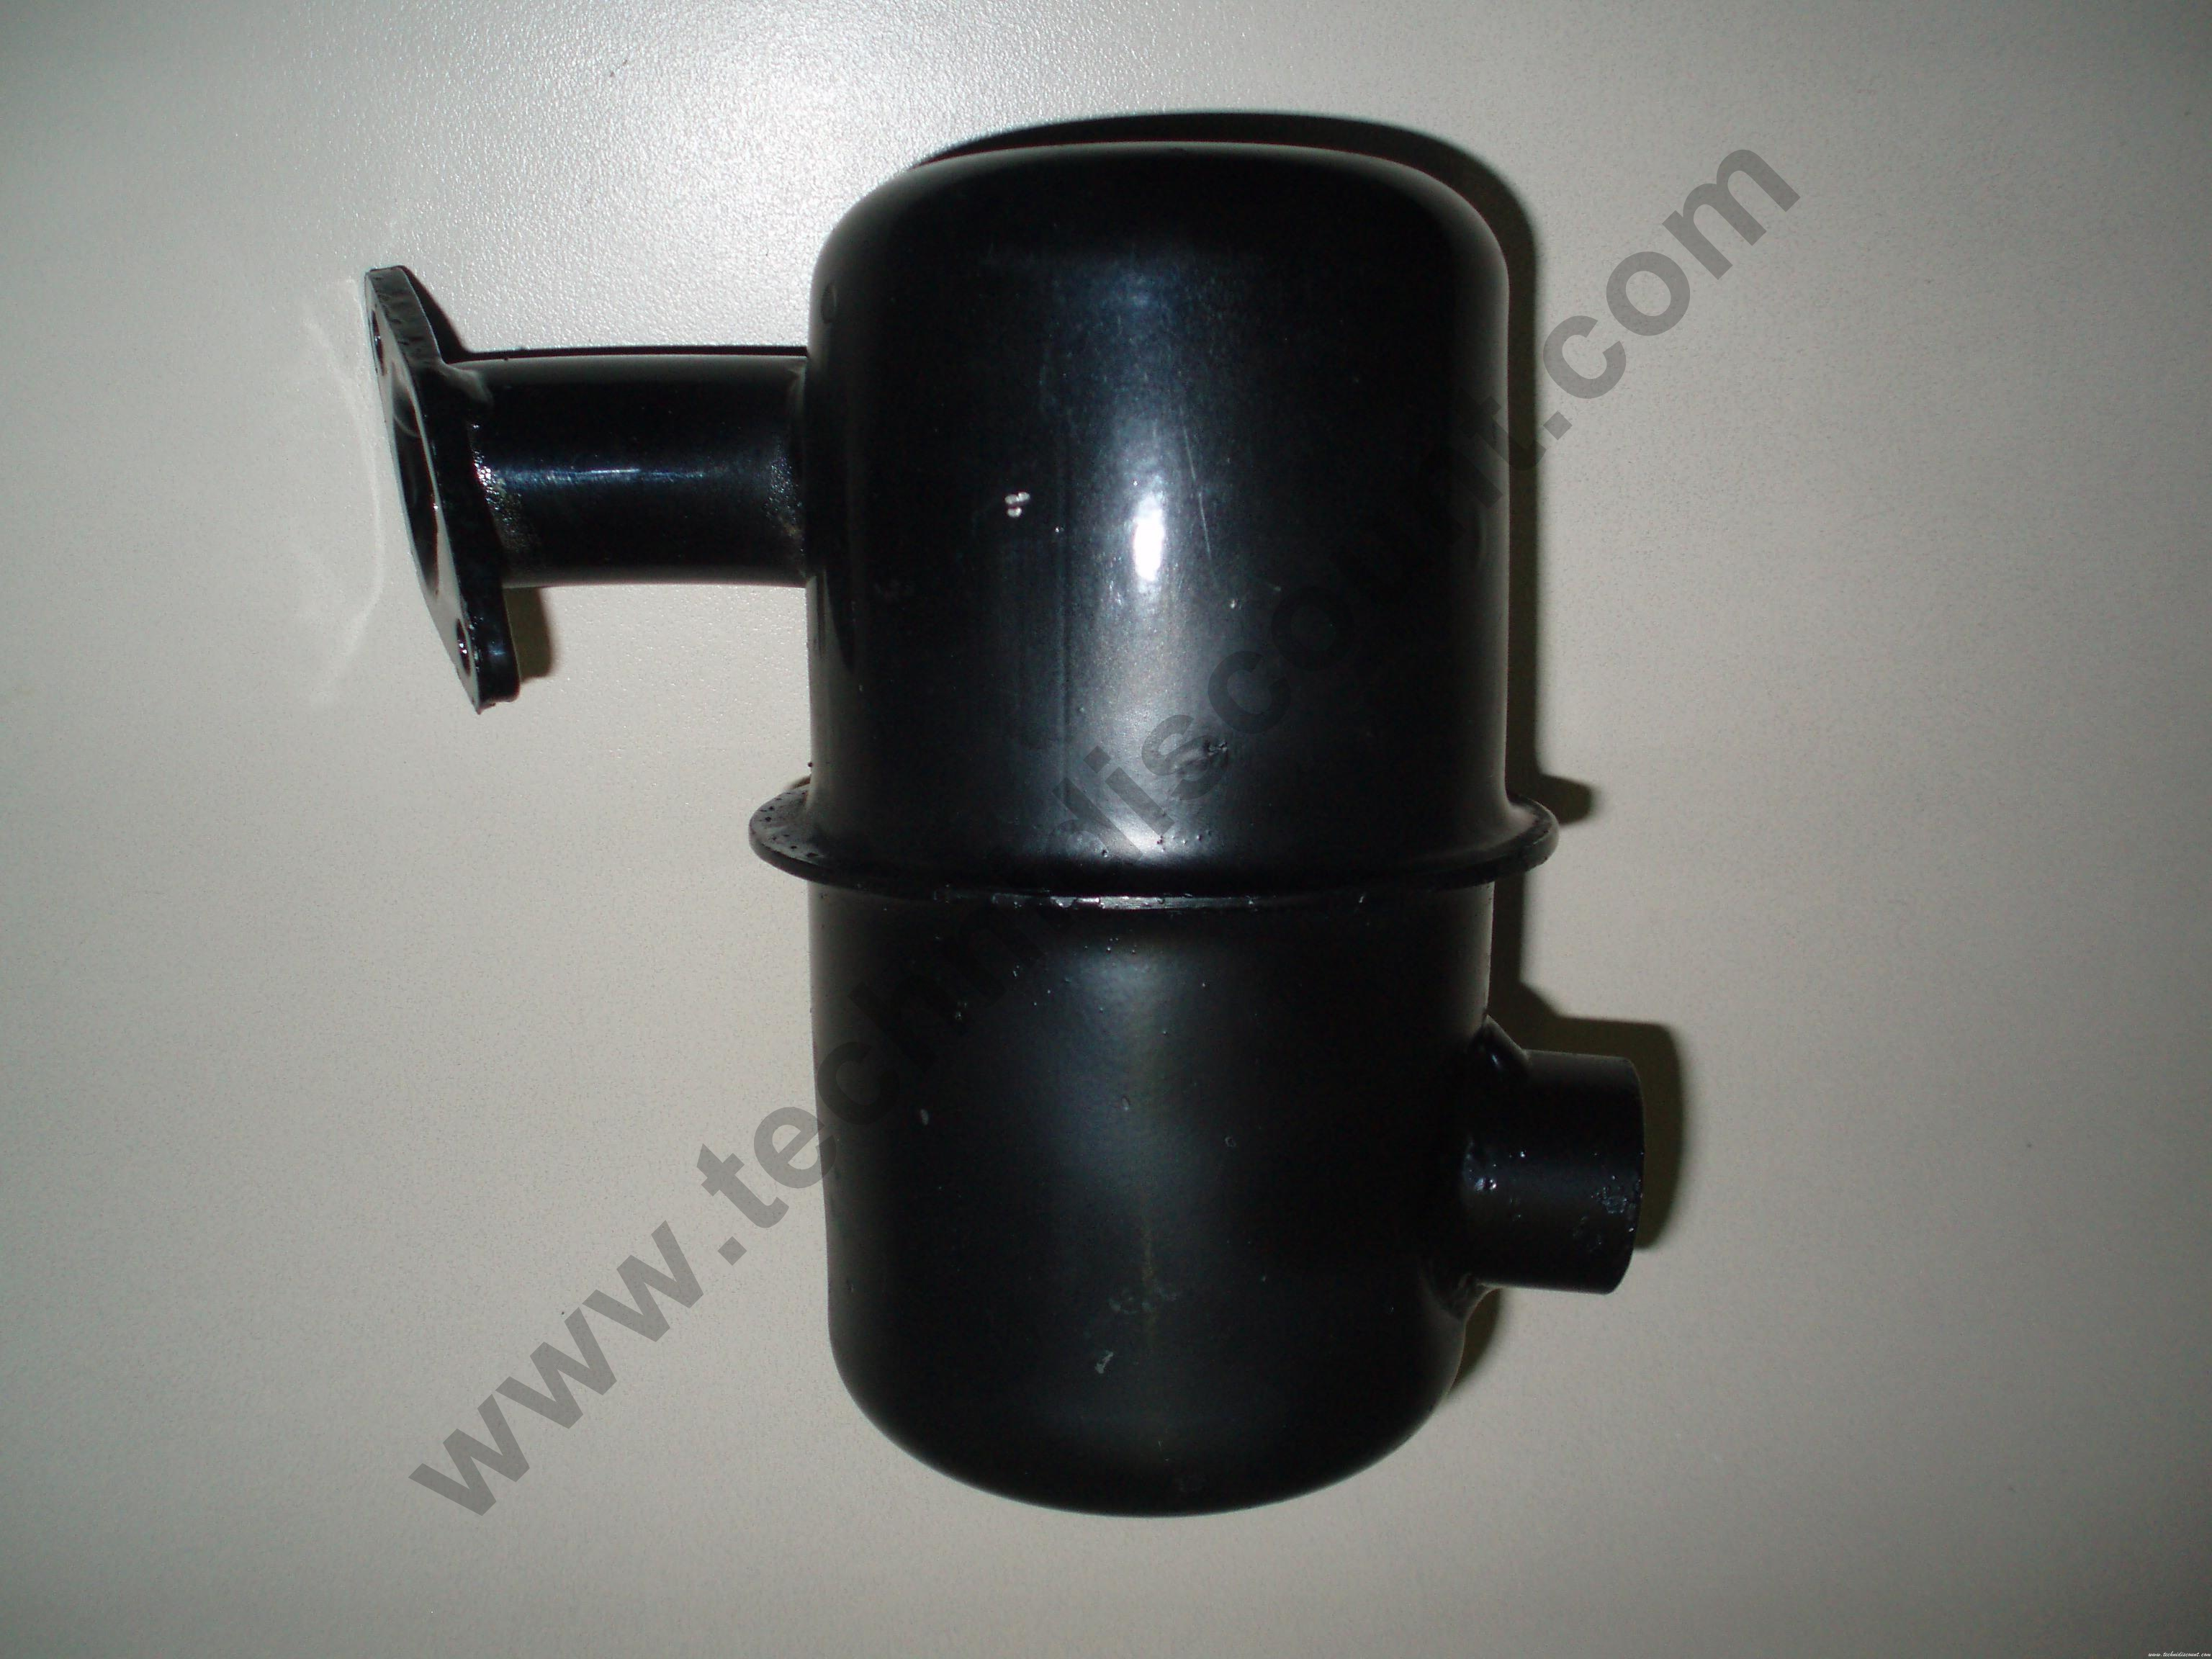 Pot Echappement IM250 IM300 IM350 LA250 LOMBARDINI ALN290 ALN330 ACME montage industriel LOMBARDINI INTERMOTOR 5460410 /  CERMAG 10136